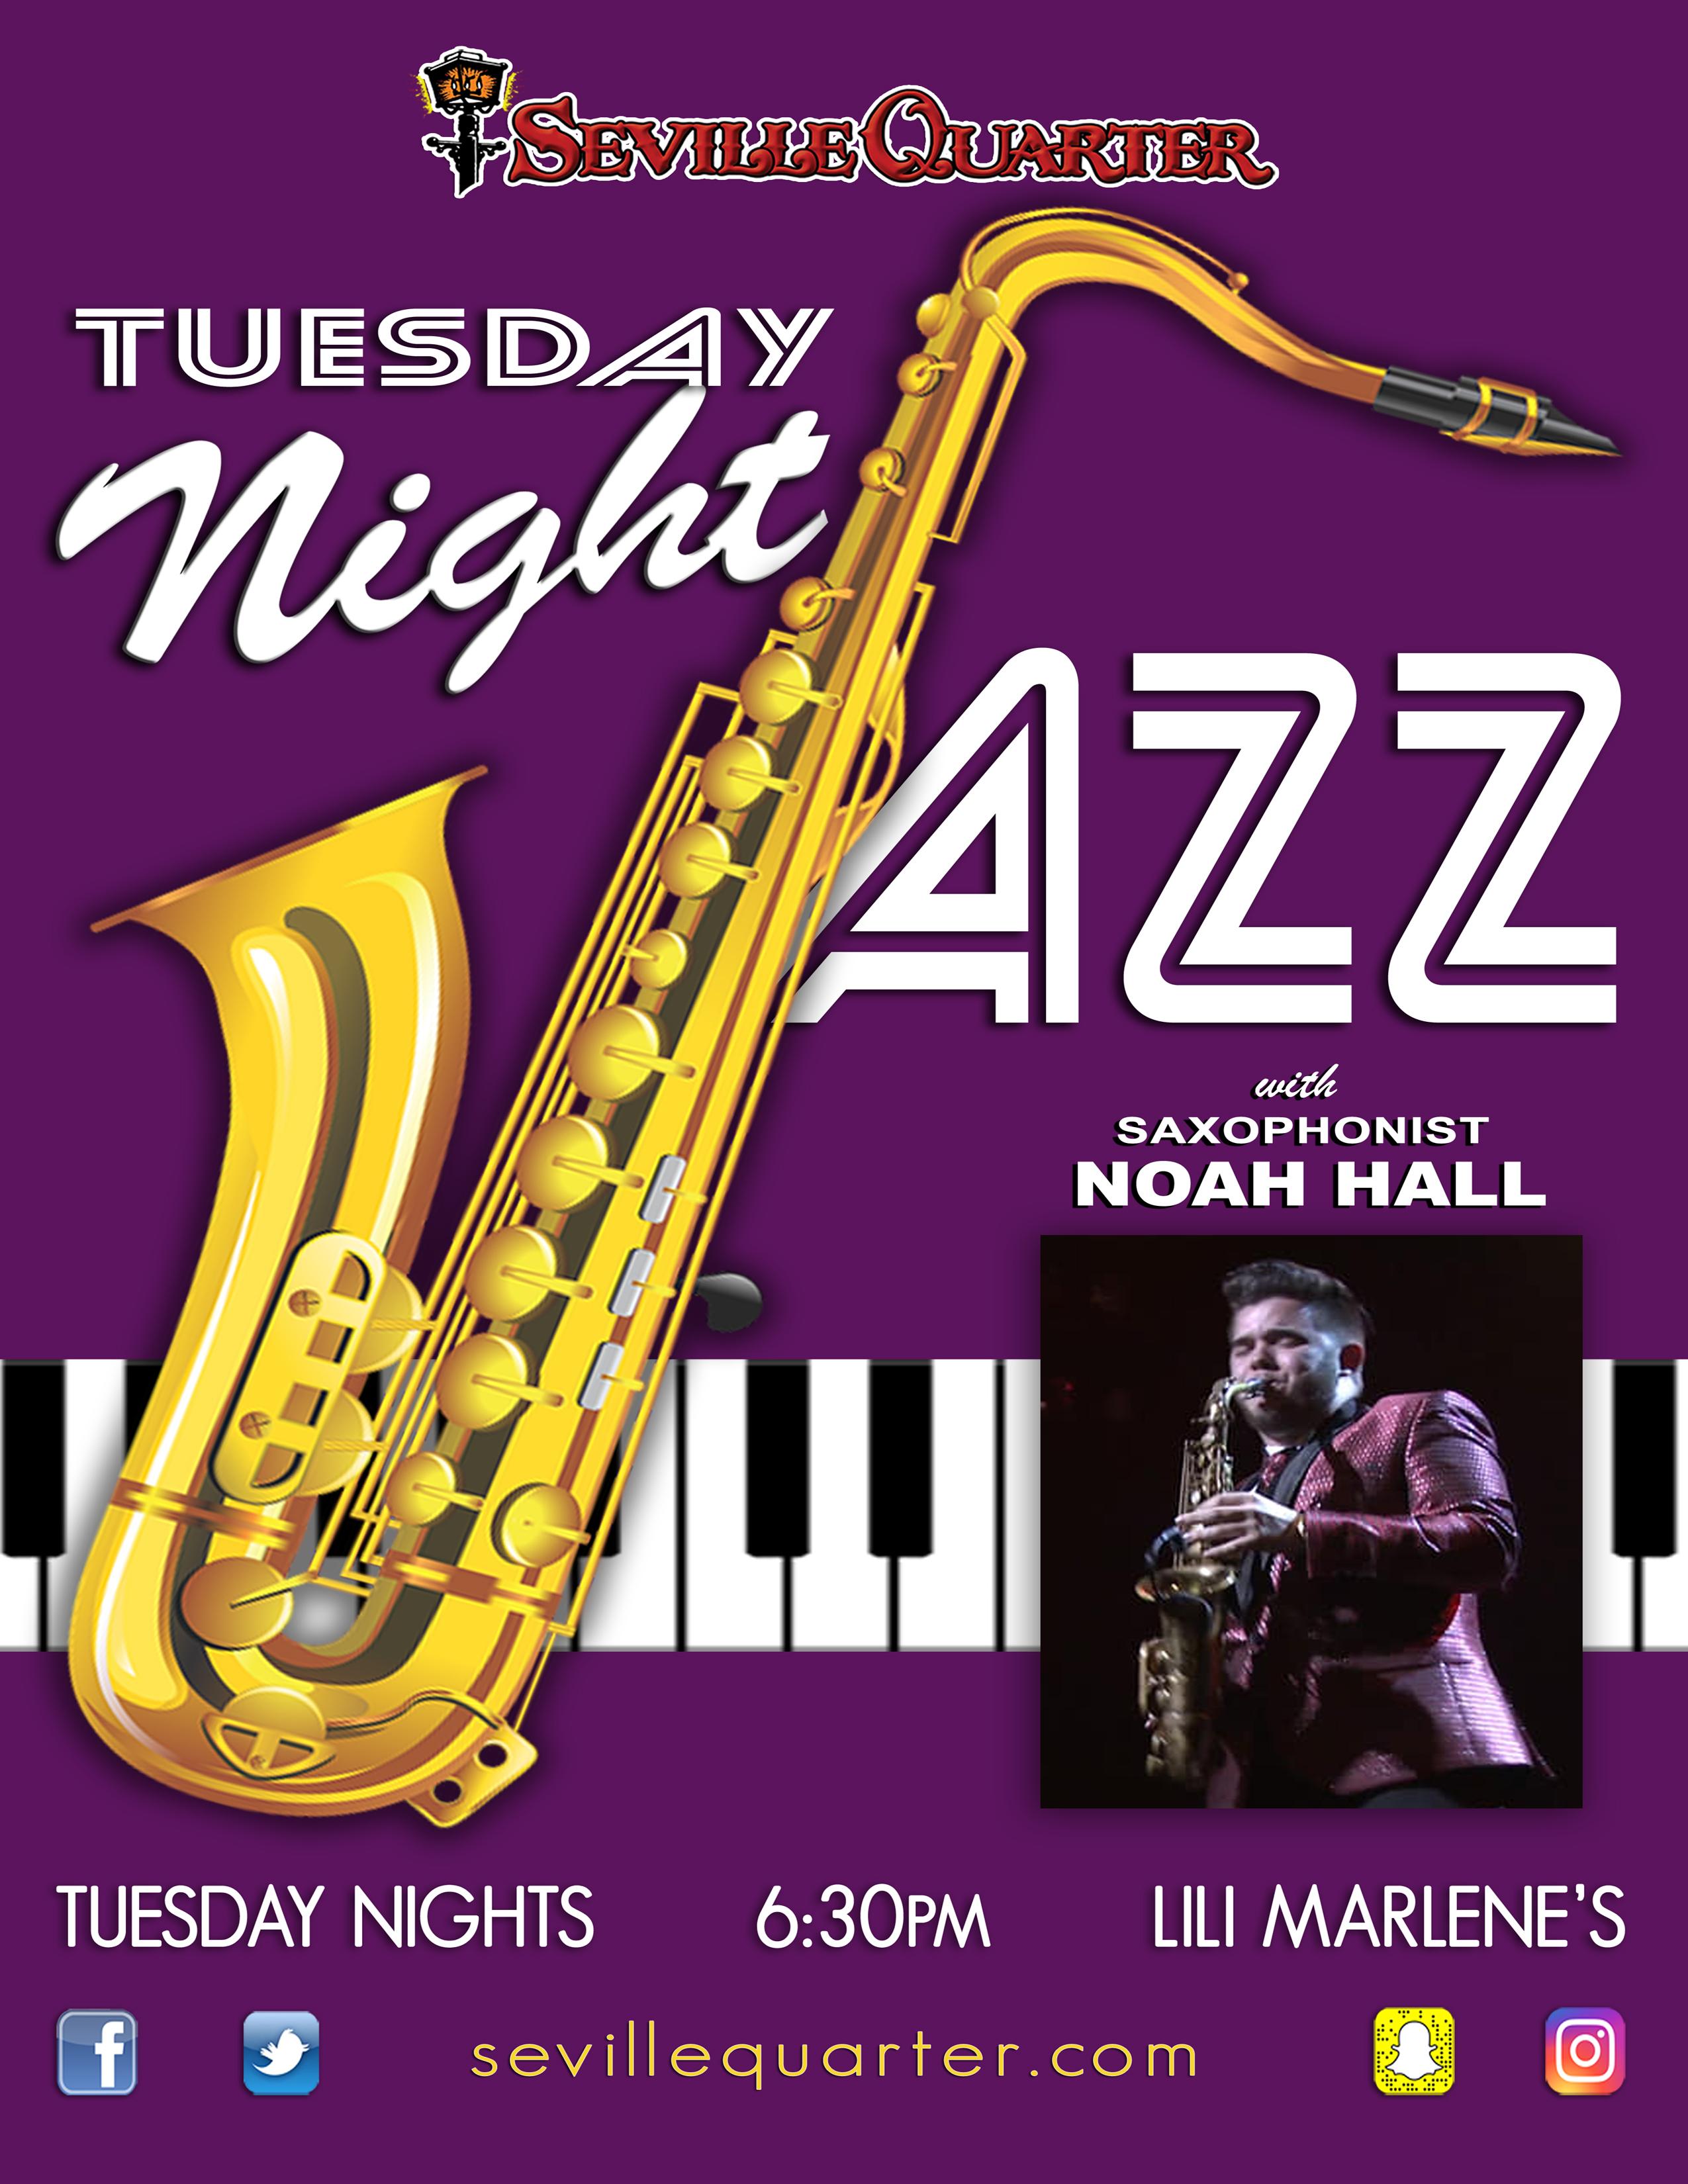 Saxophonist Noah Hall